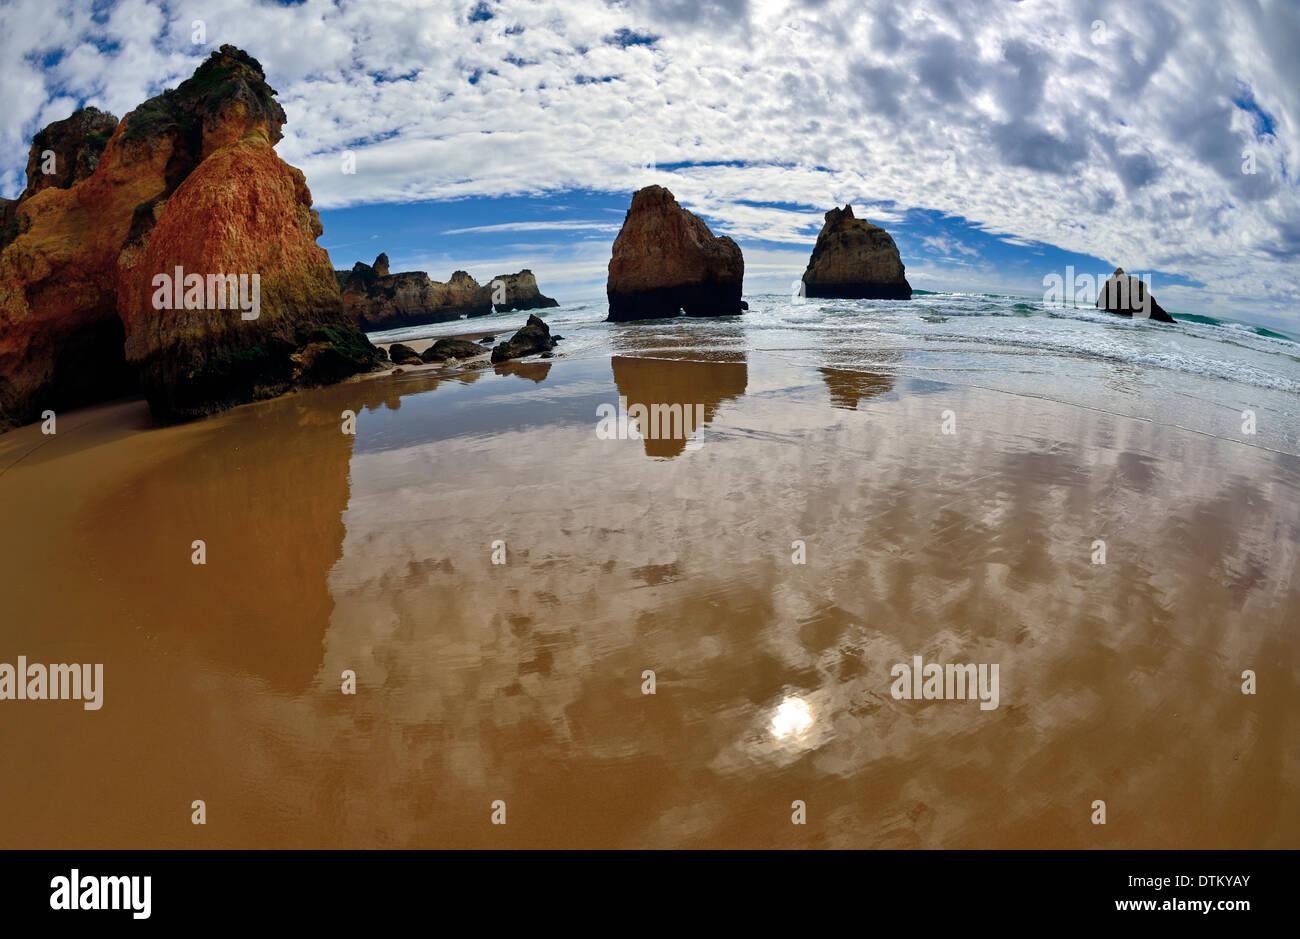 Portugal, Algarve: Rocks and waves at beach Prainha - Stock Image